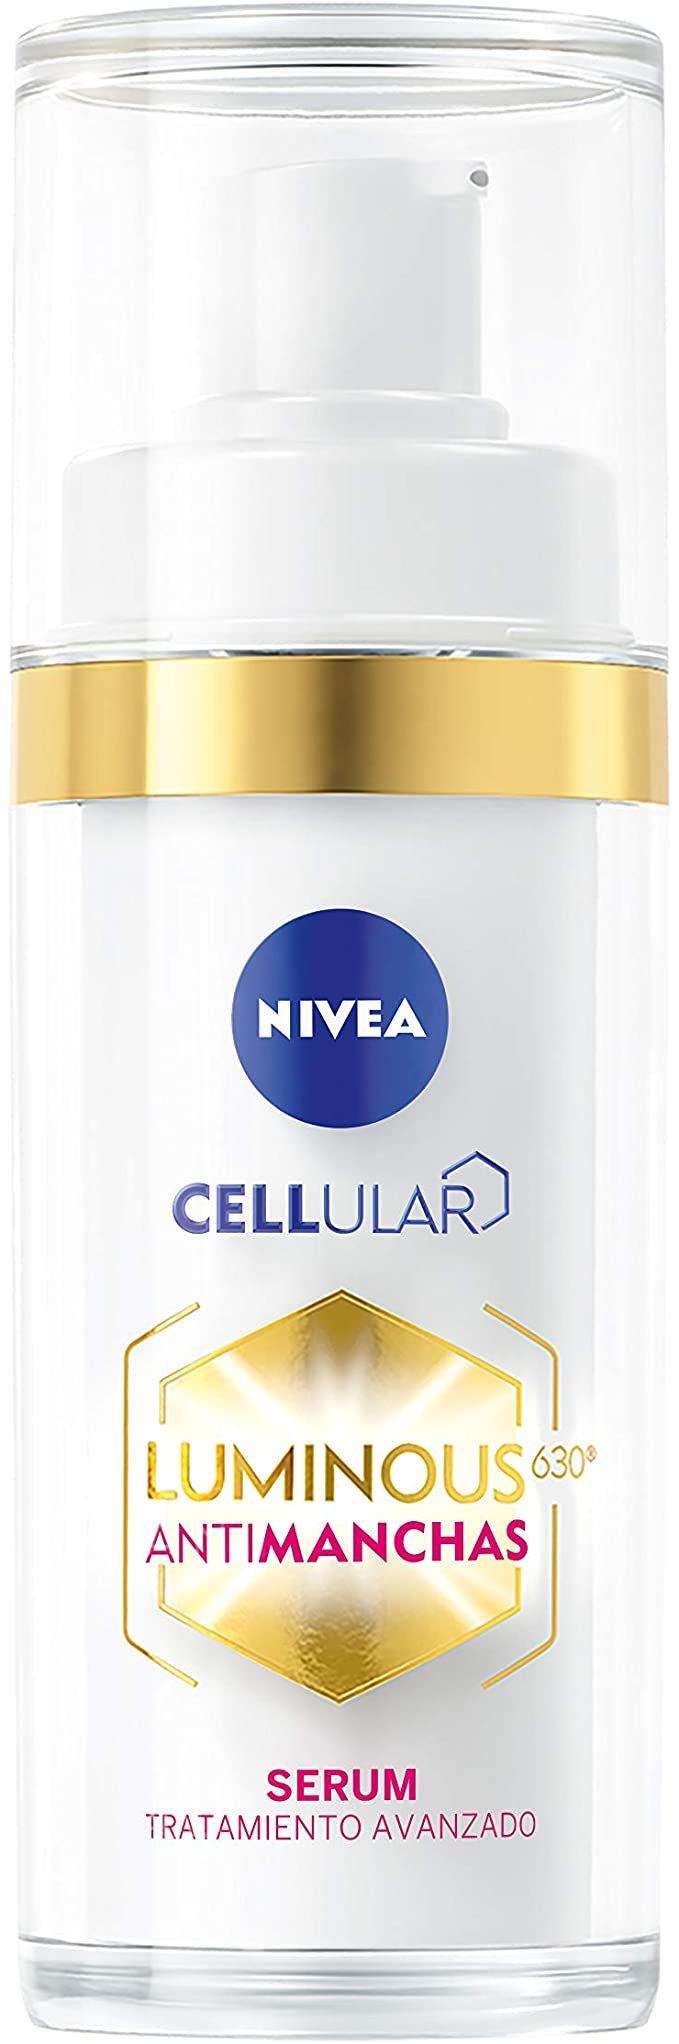 NIVEA Cellular LUMINOUS 630 Antimanchas